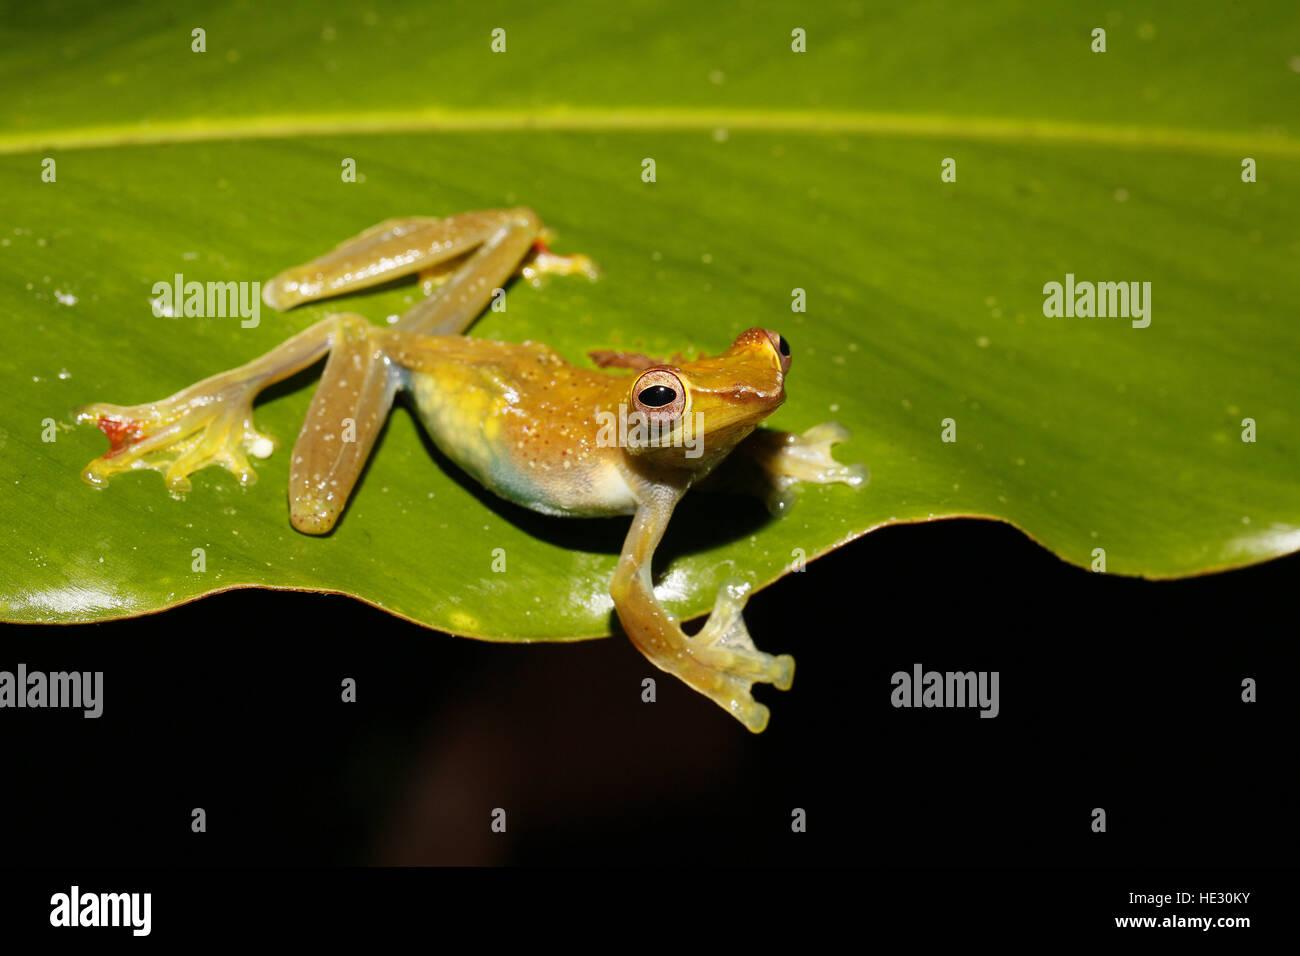 Jade Tree Frog, Rhacophorus dulitensis, female with eggs visible through skin - Stock Image